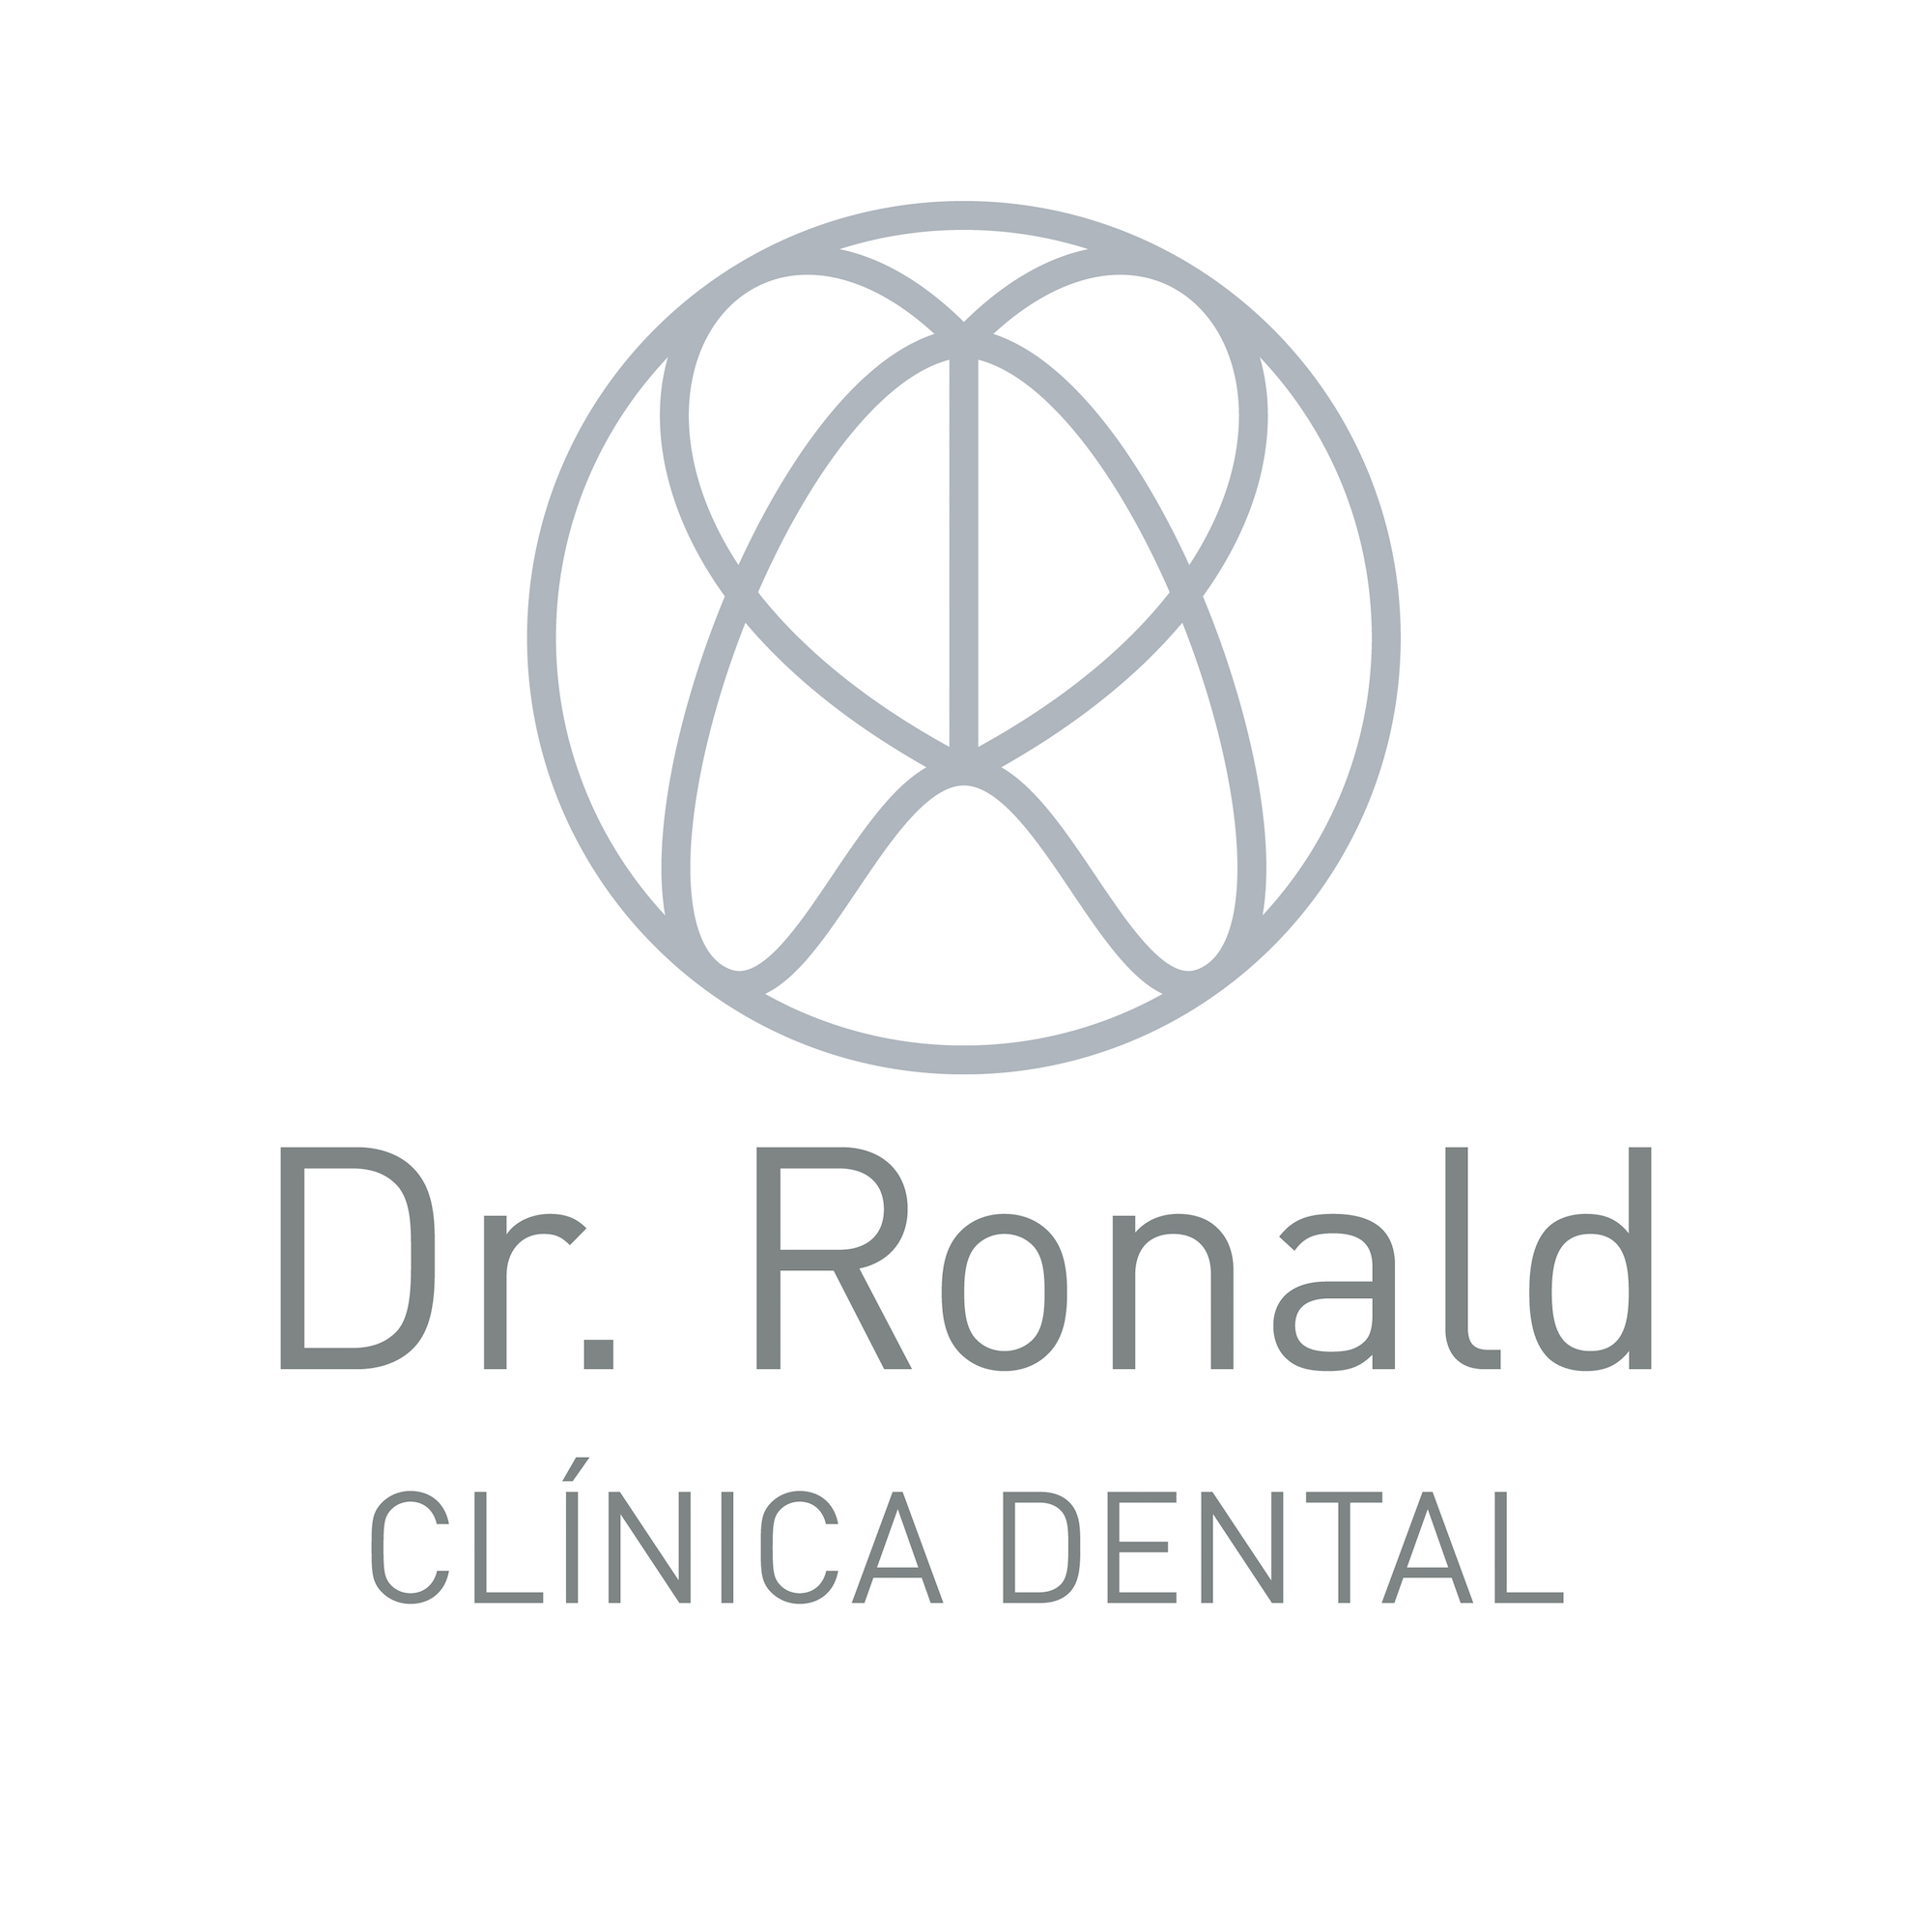 Clínica de Estética Dental Dr. Ronald